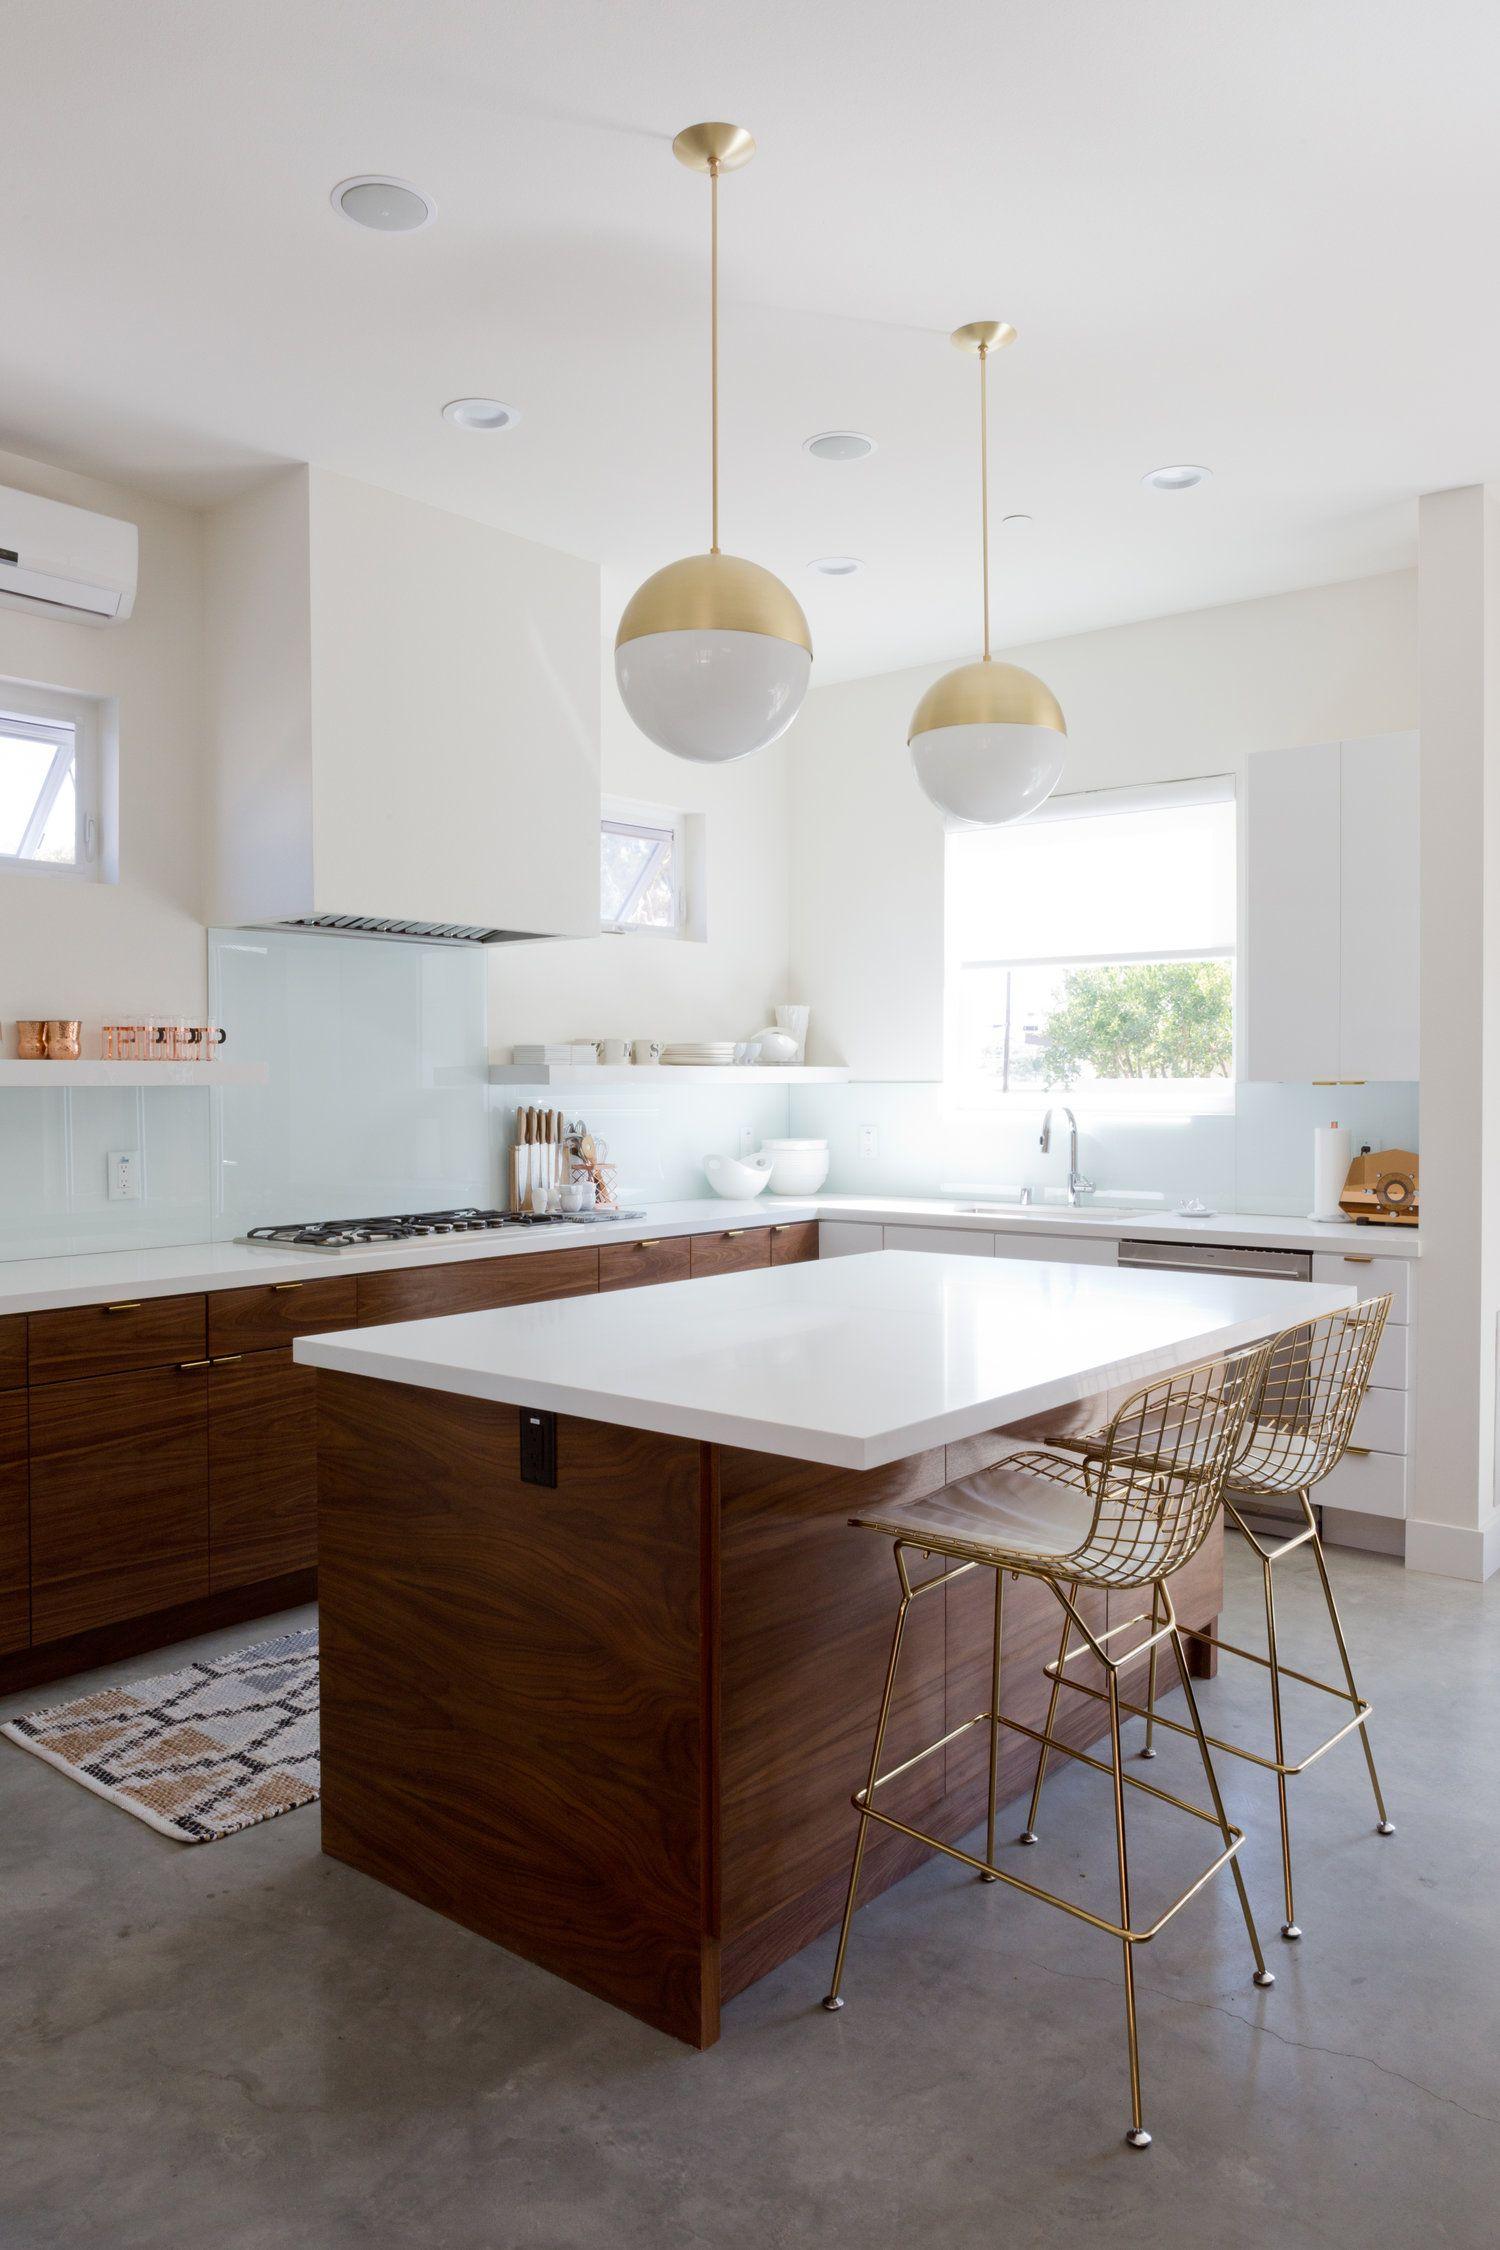 A Dreamy Modern Beach House in Redondo Beach - First Floor   Küche